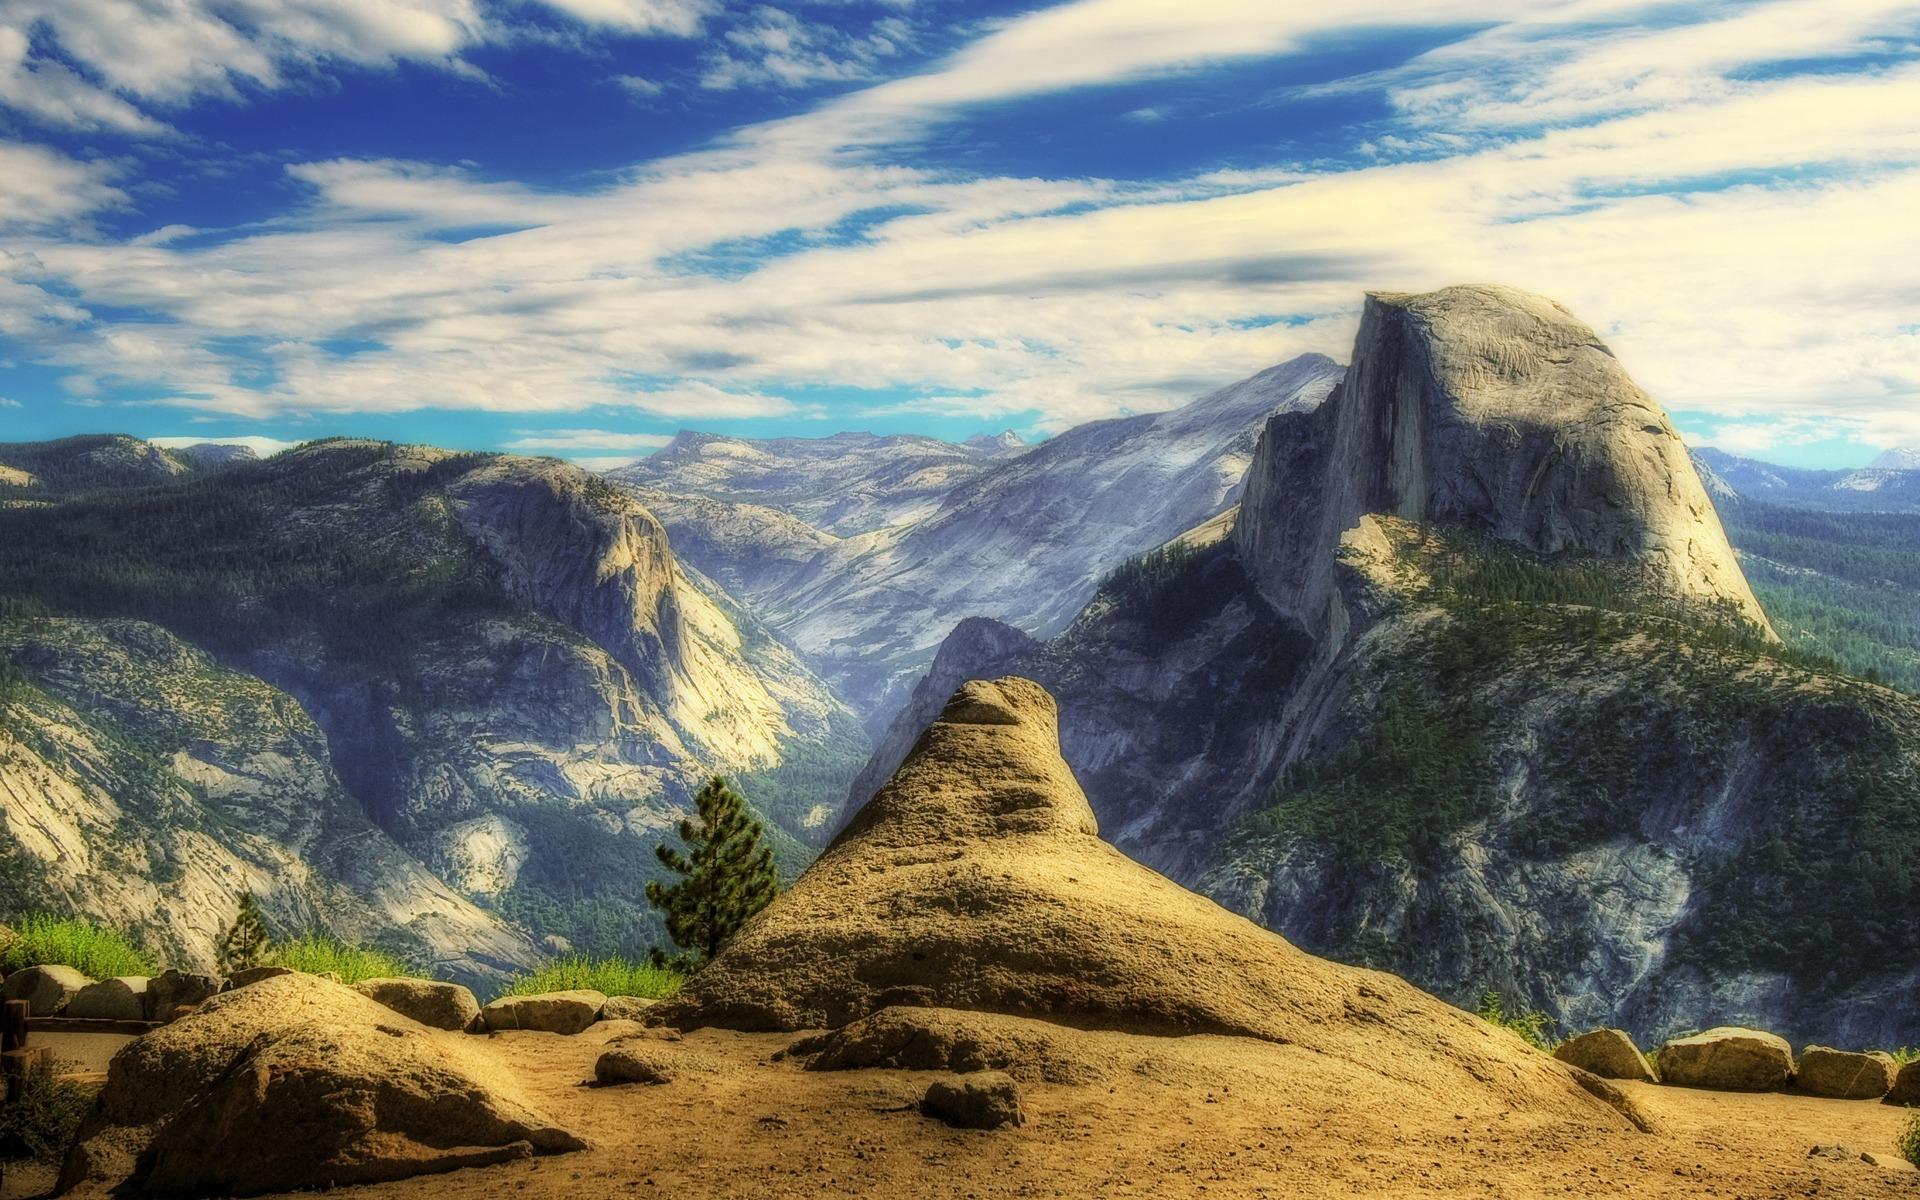 California Mountains United States Wallpaper 1920x1200